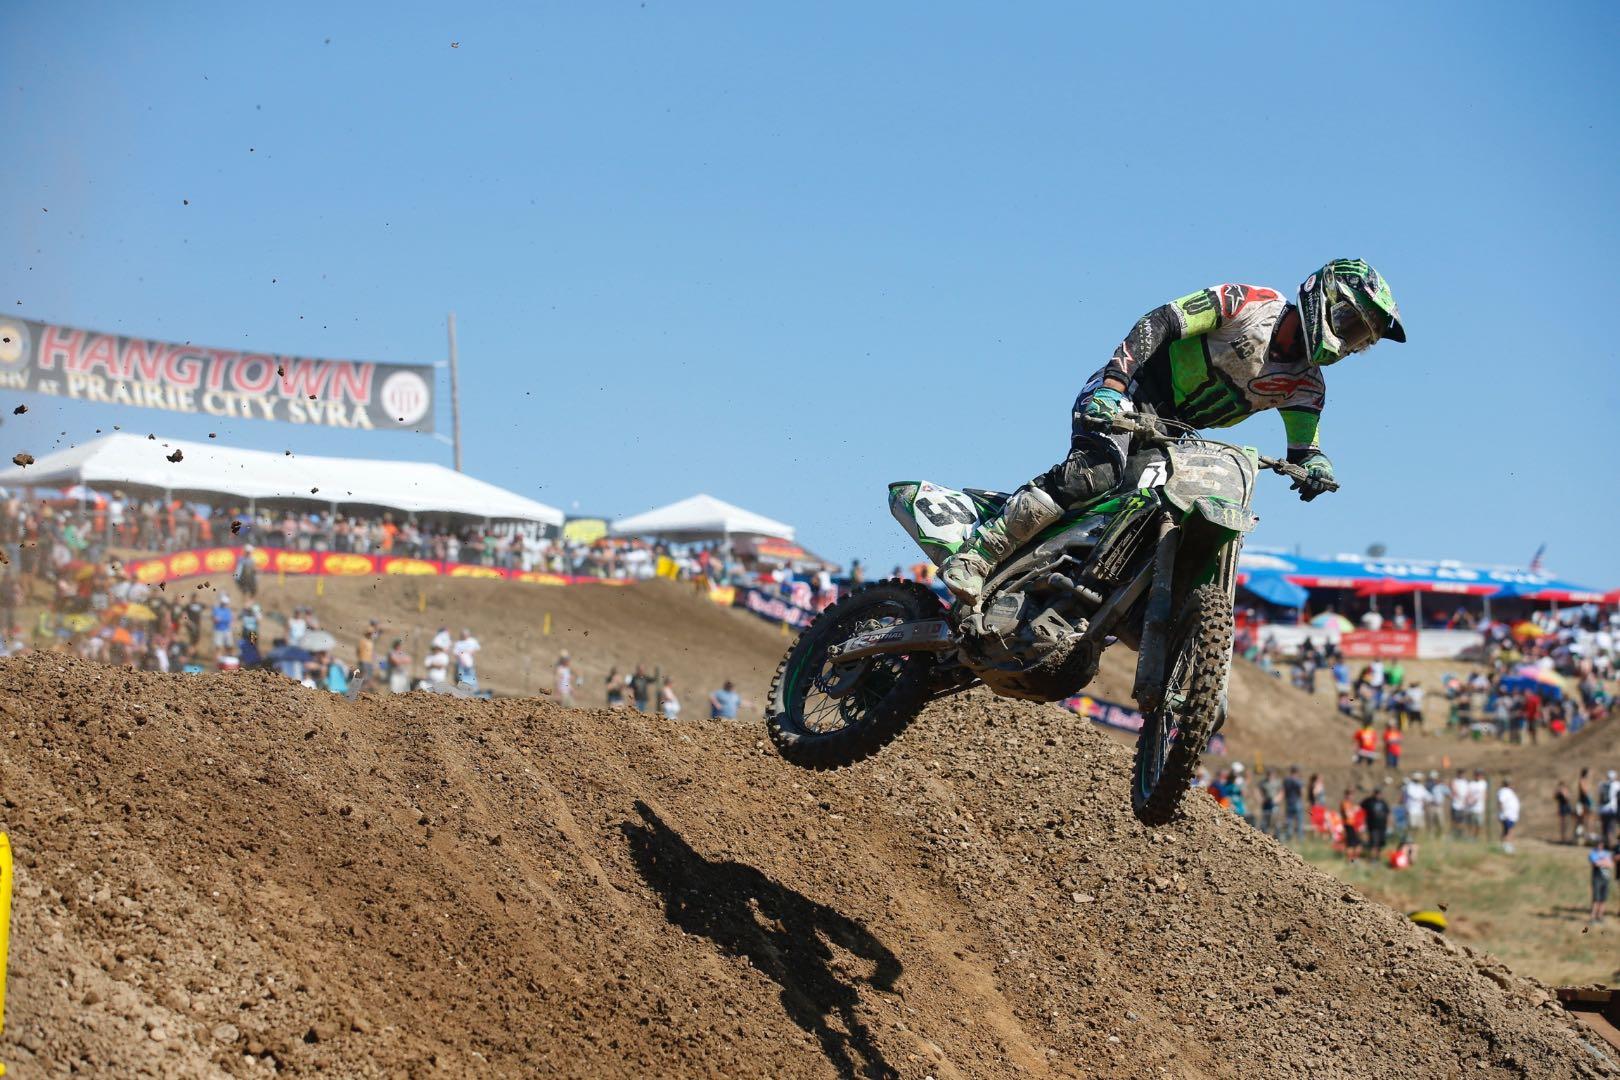 2017 Budds Creek Motocross: Kawasaki's Eli Tomac